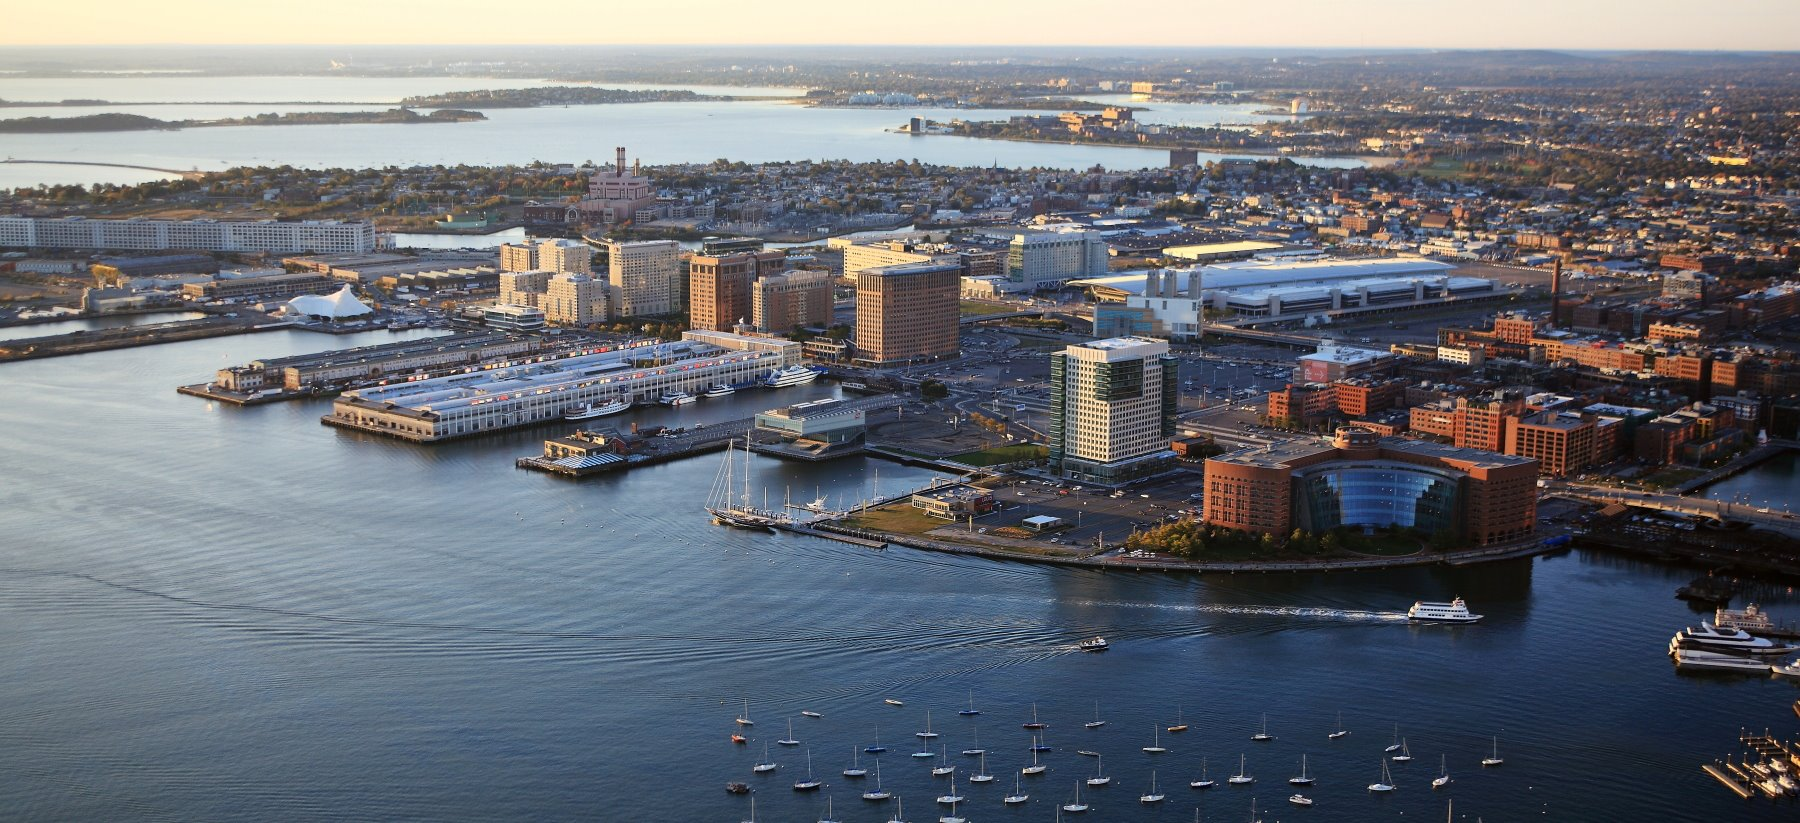 Seaport-luxury-condos-and-rentals